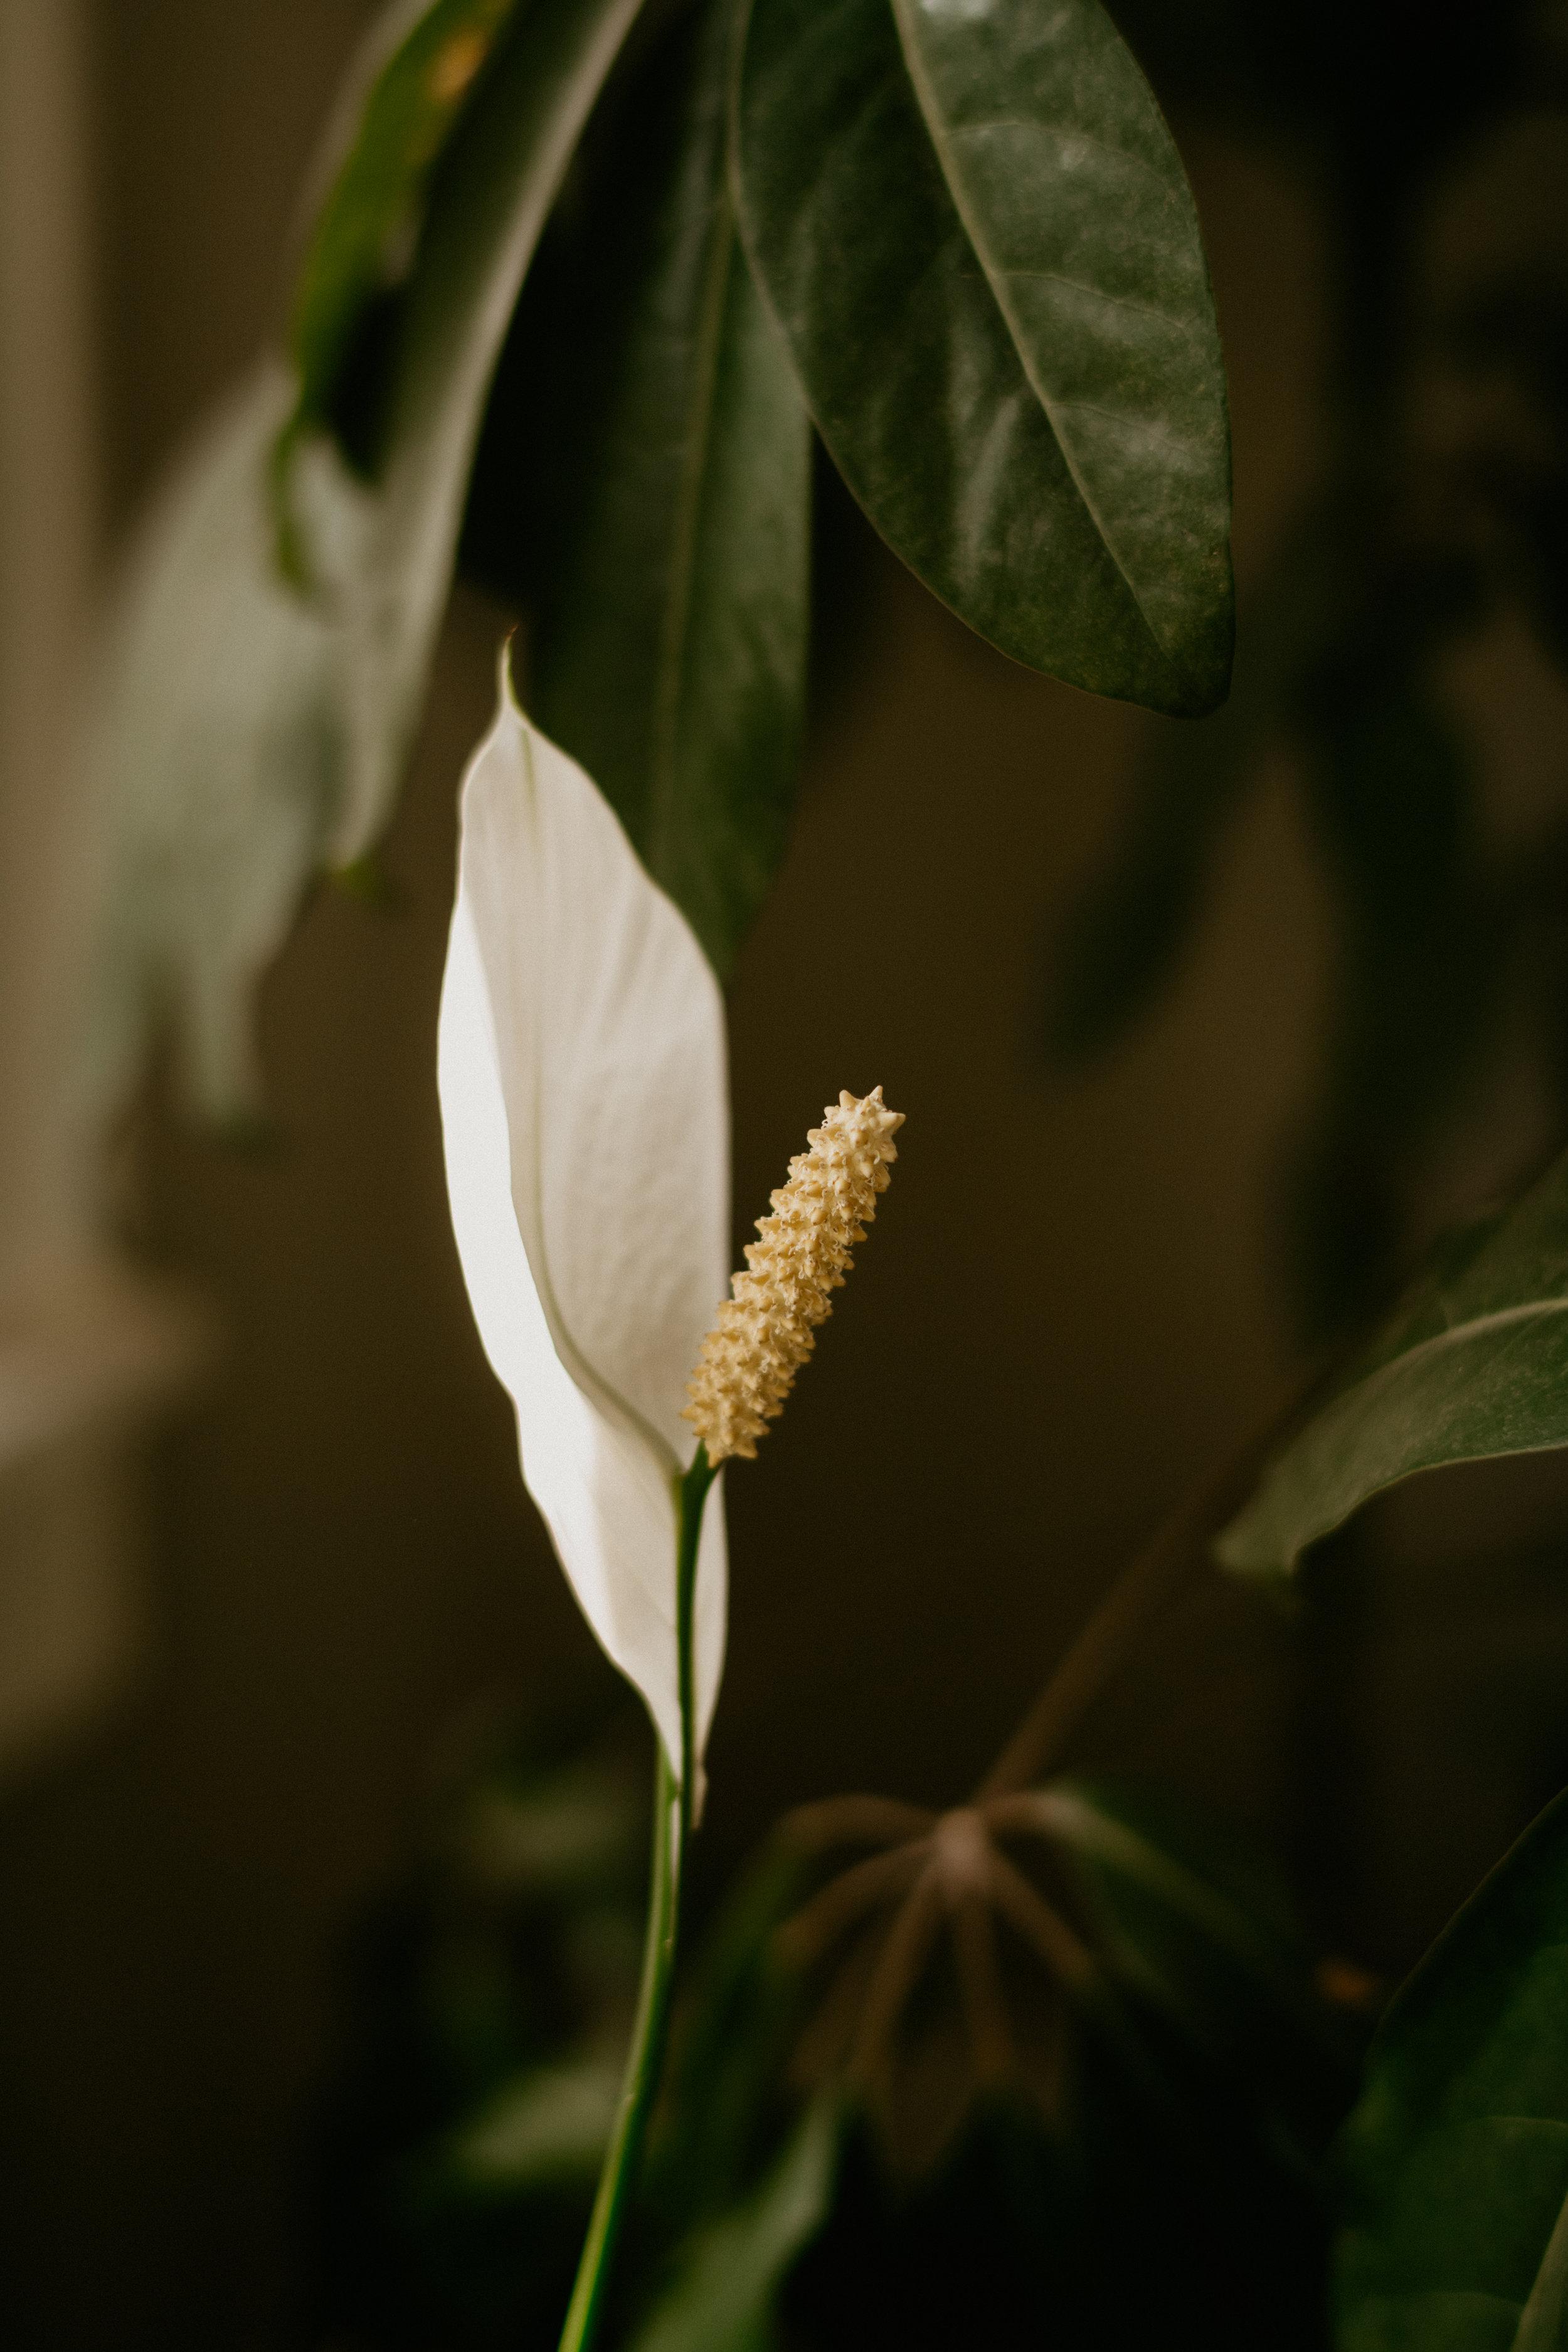 houseplants-care-3010.jpg